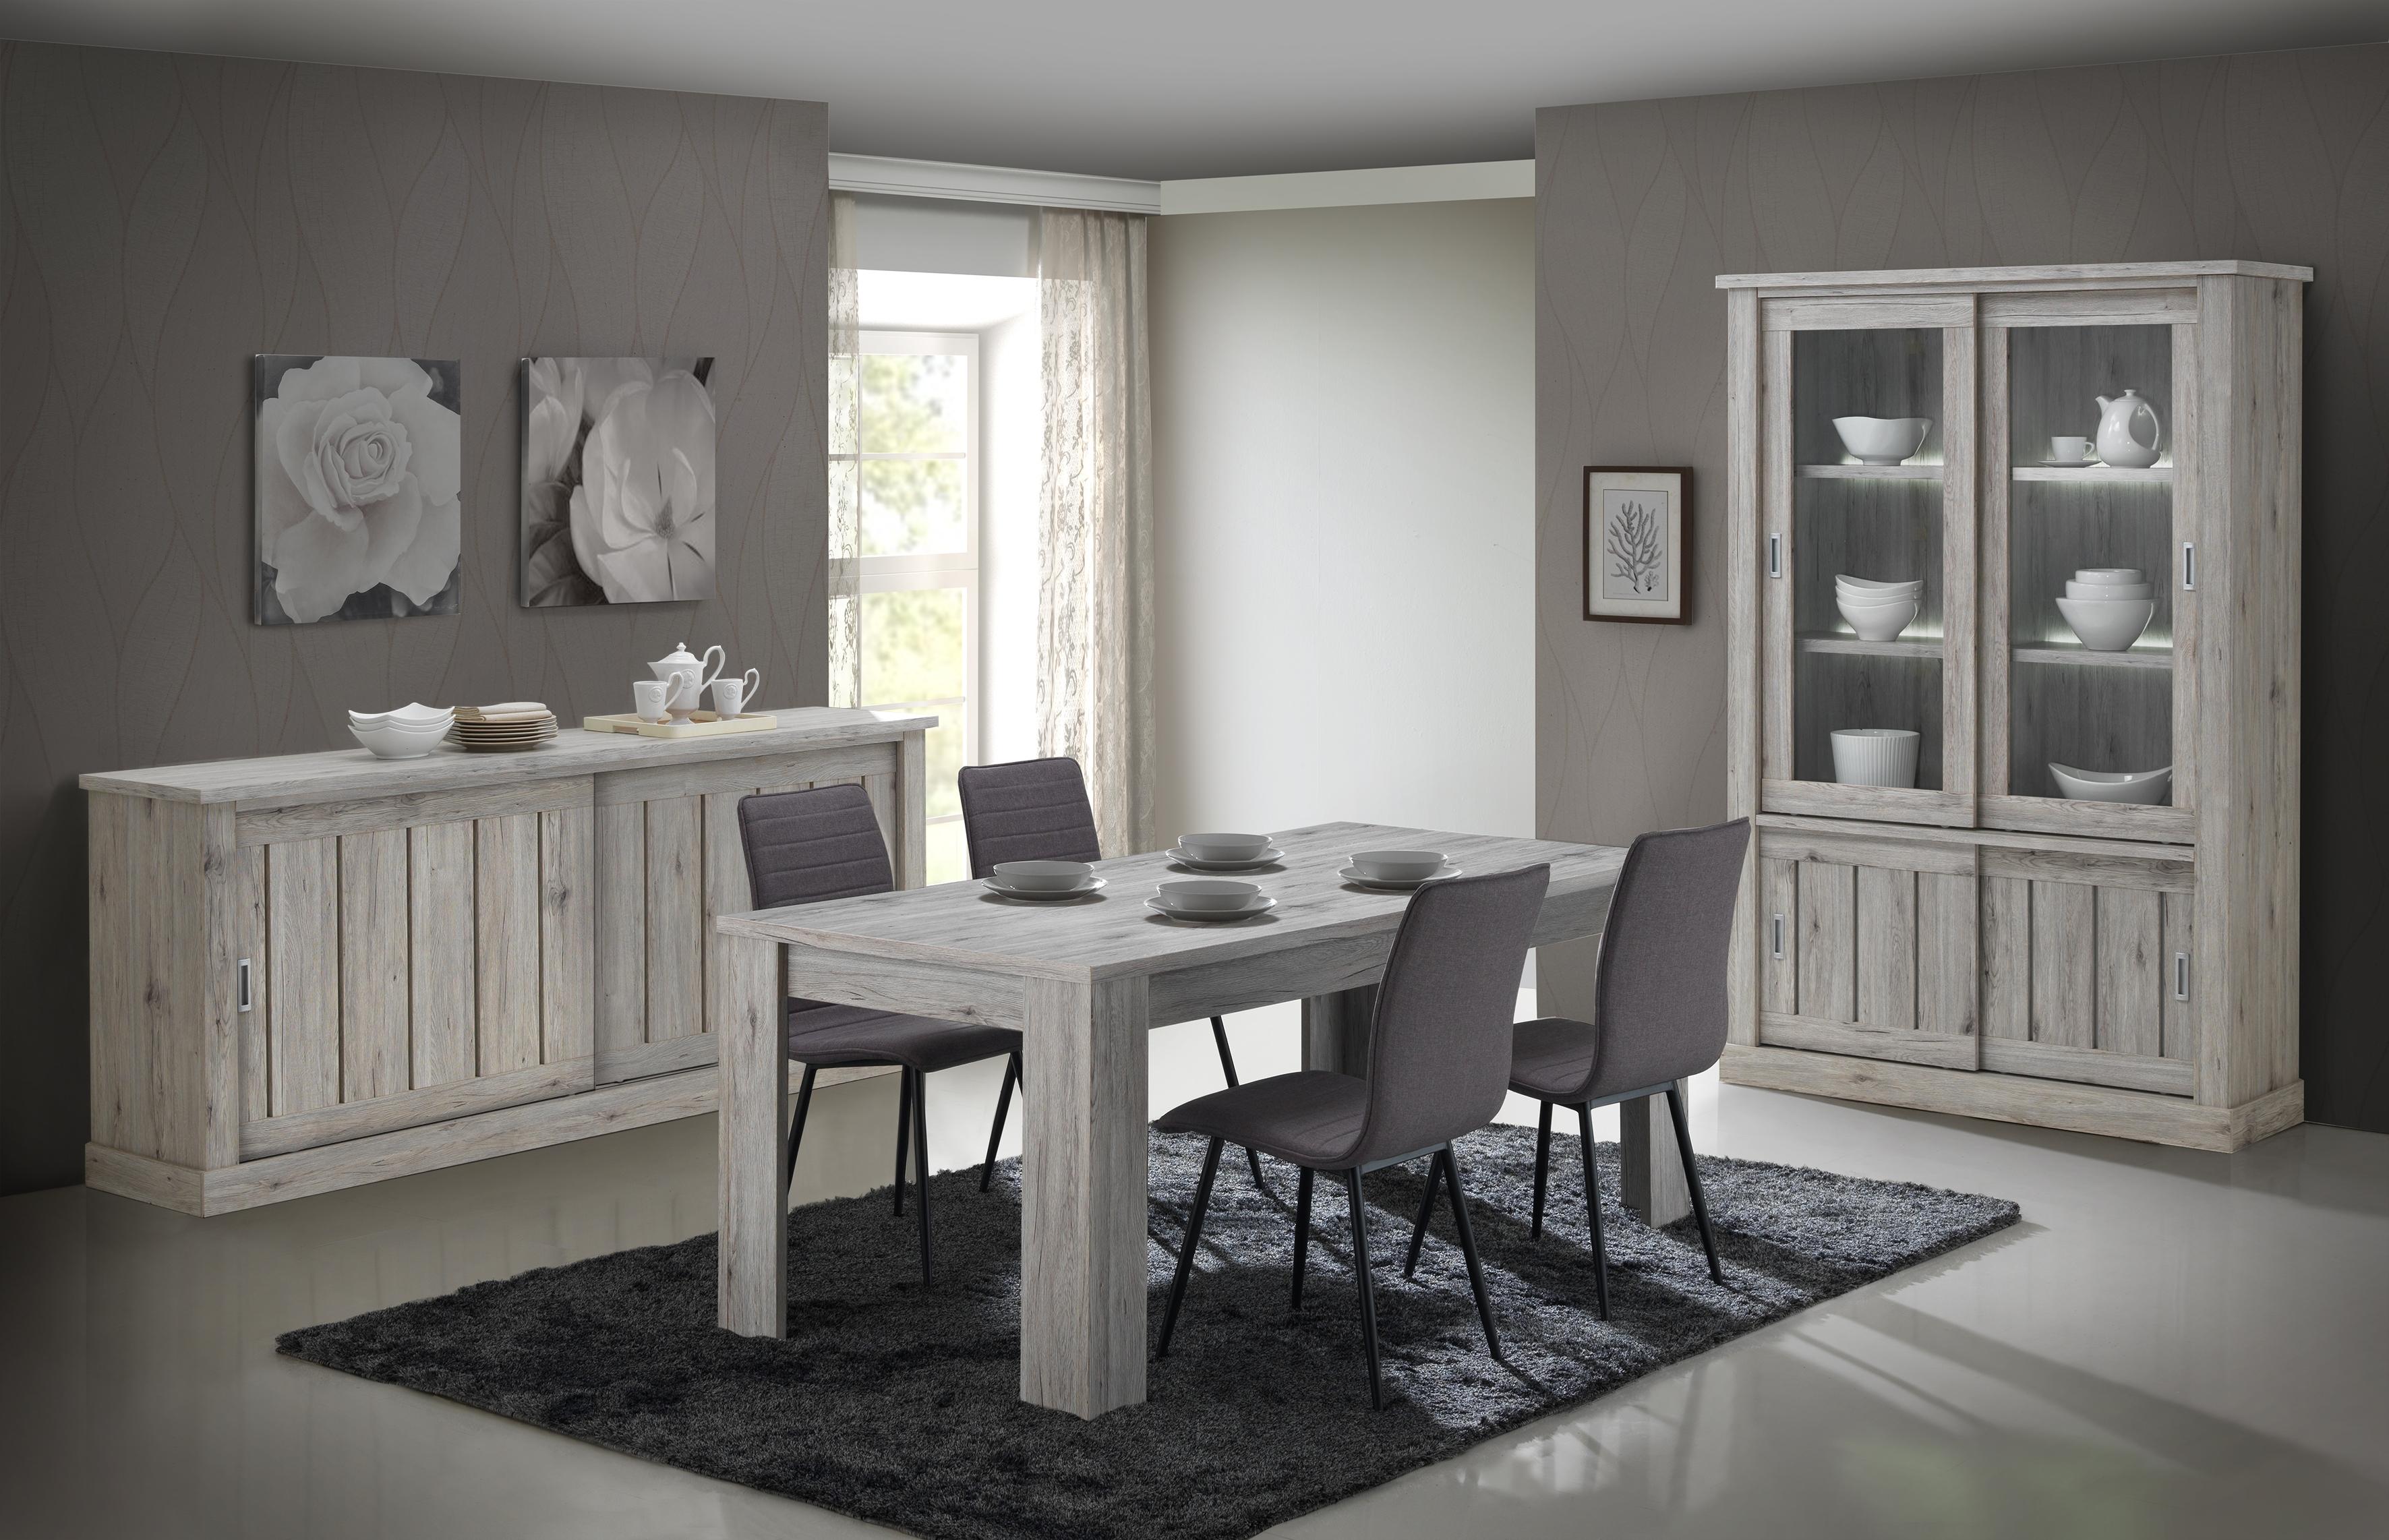 Eetkamer Massief Hout : Een mooie eetkamer van stevige kwaliteit belga meubelen